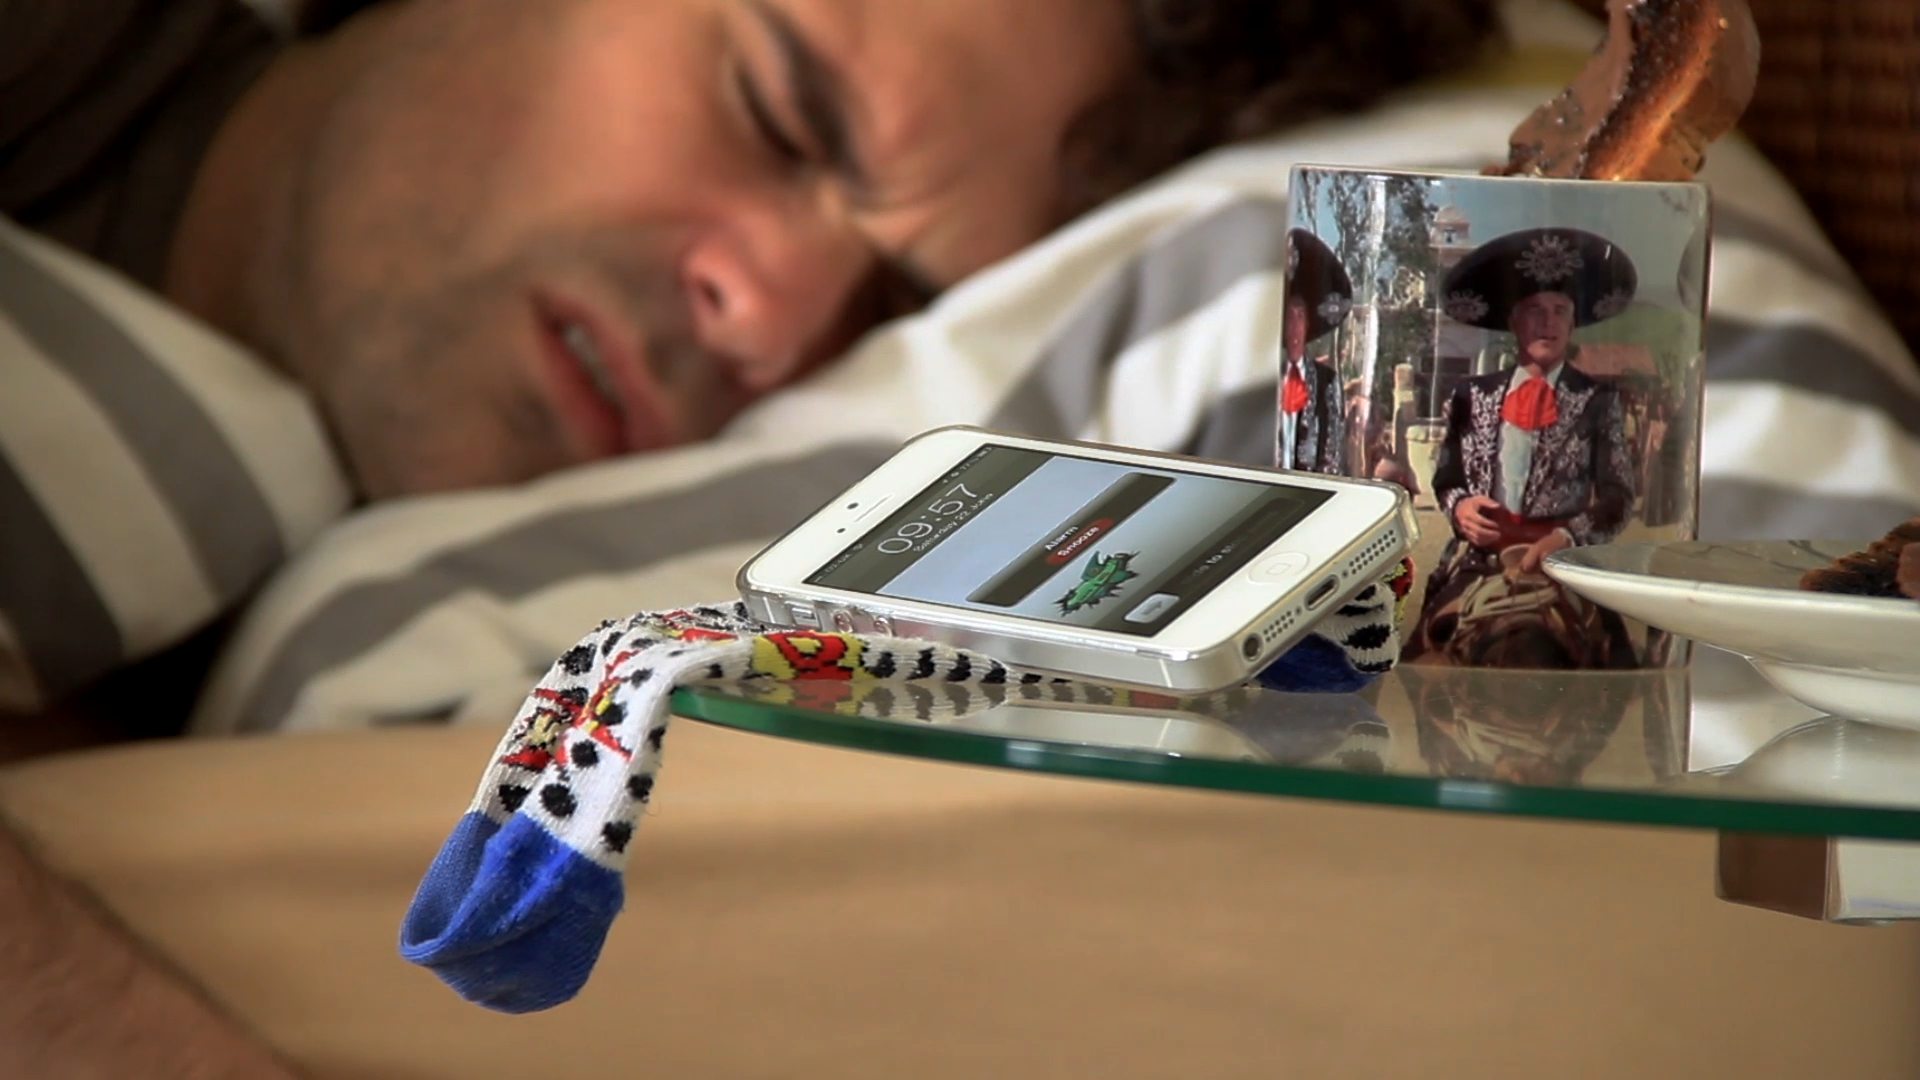 Paul in bed0